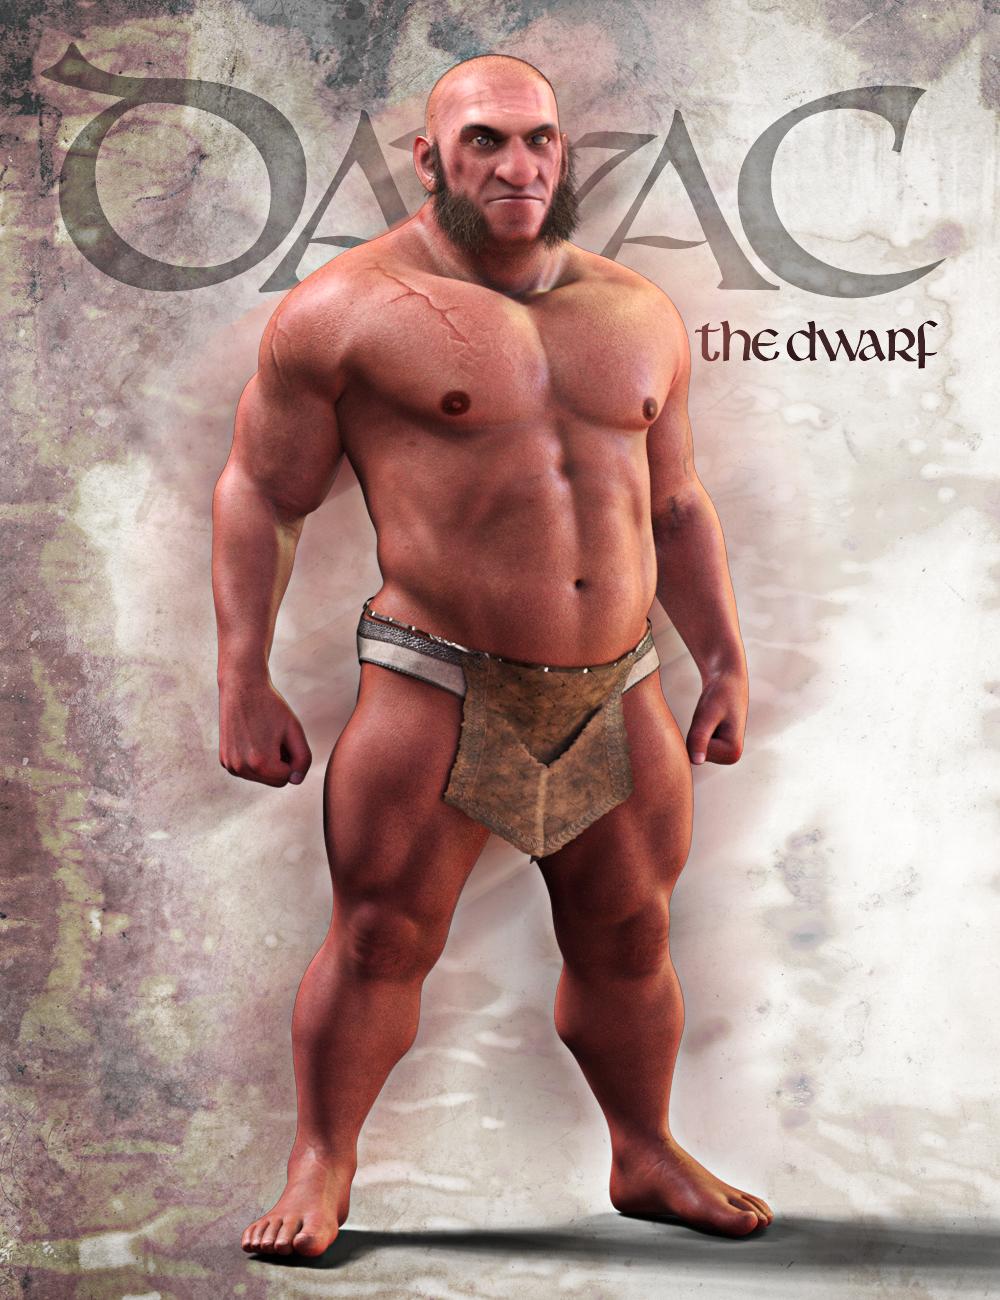 Davac The Dwarf for Genesis 8 Male by: Matari3D, 3D Models by Daz 3D